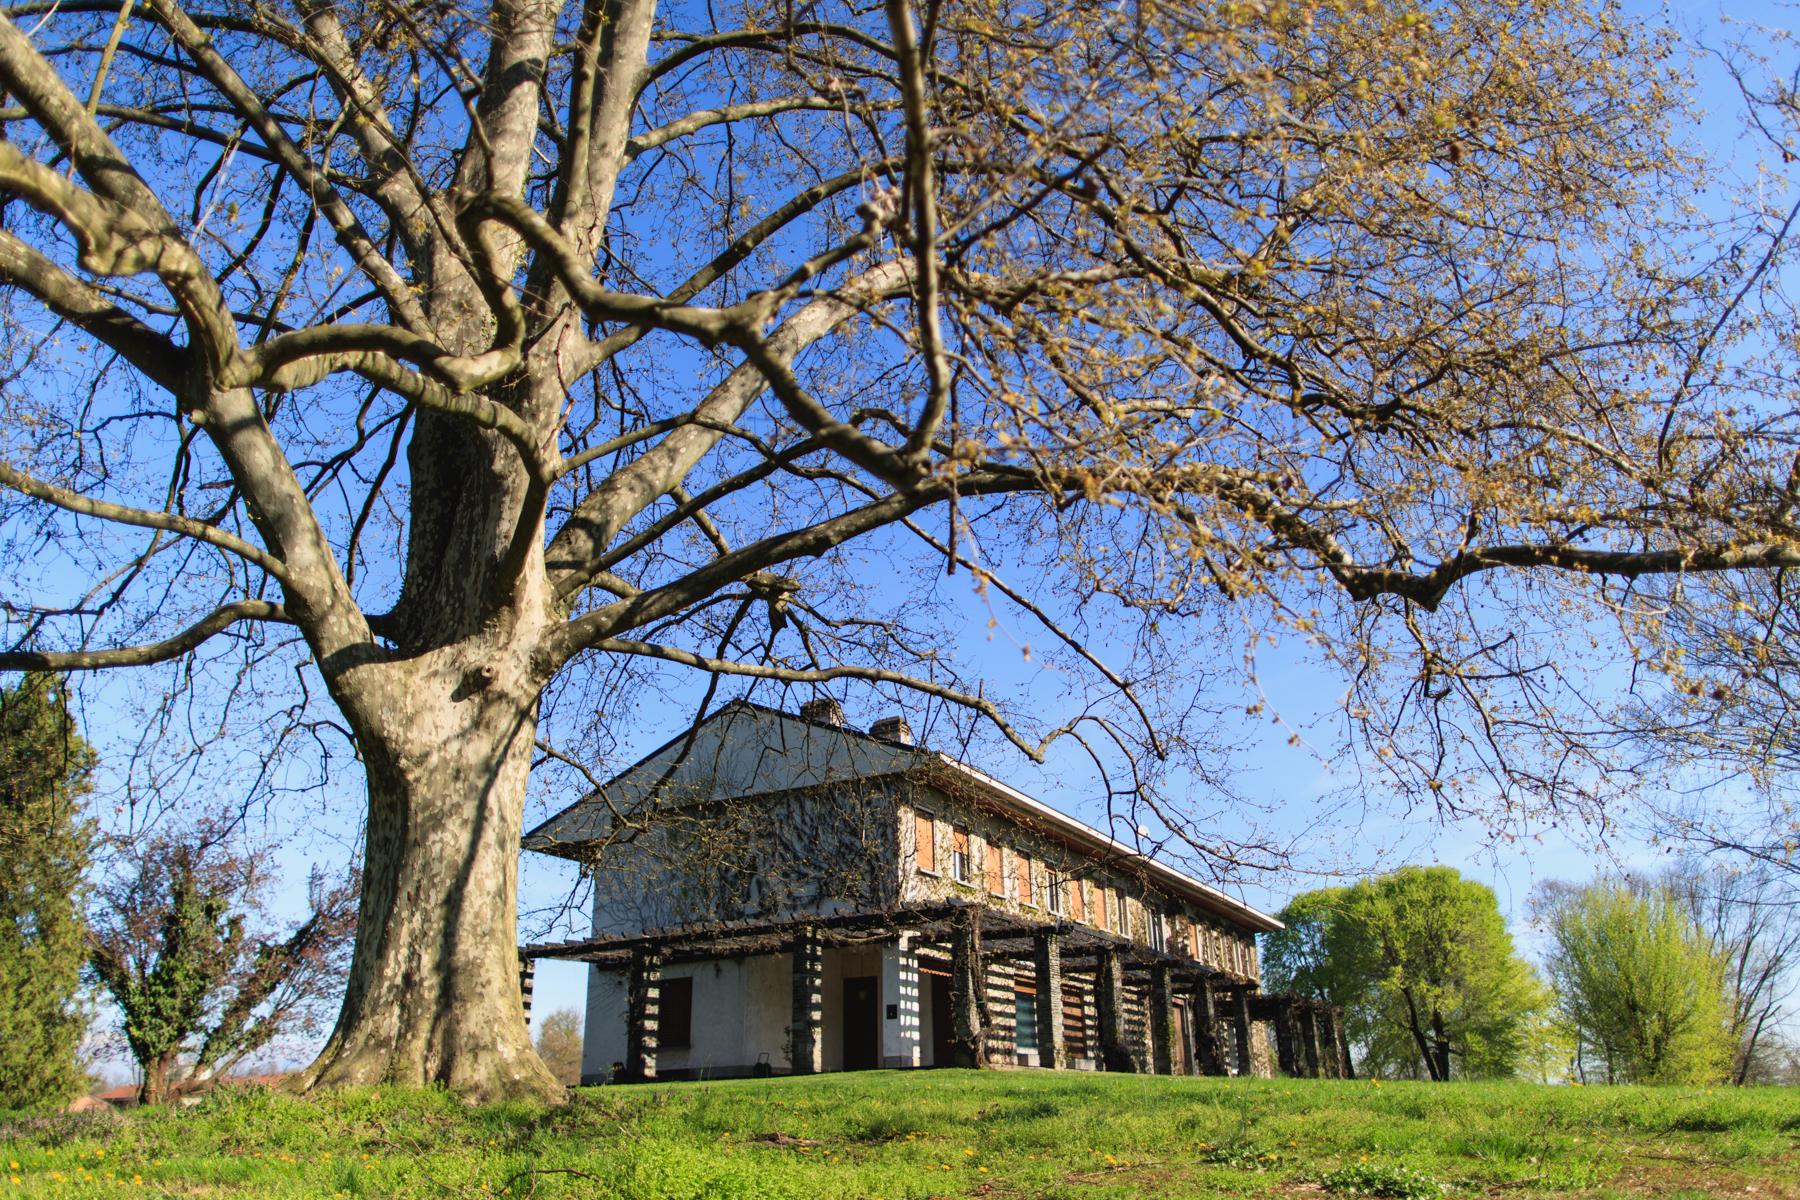 Casa indipendente in Vendita a Venaria: 5 locali, 1000 mq - Foto 3